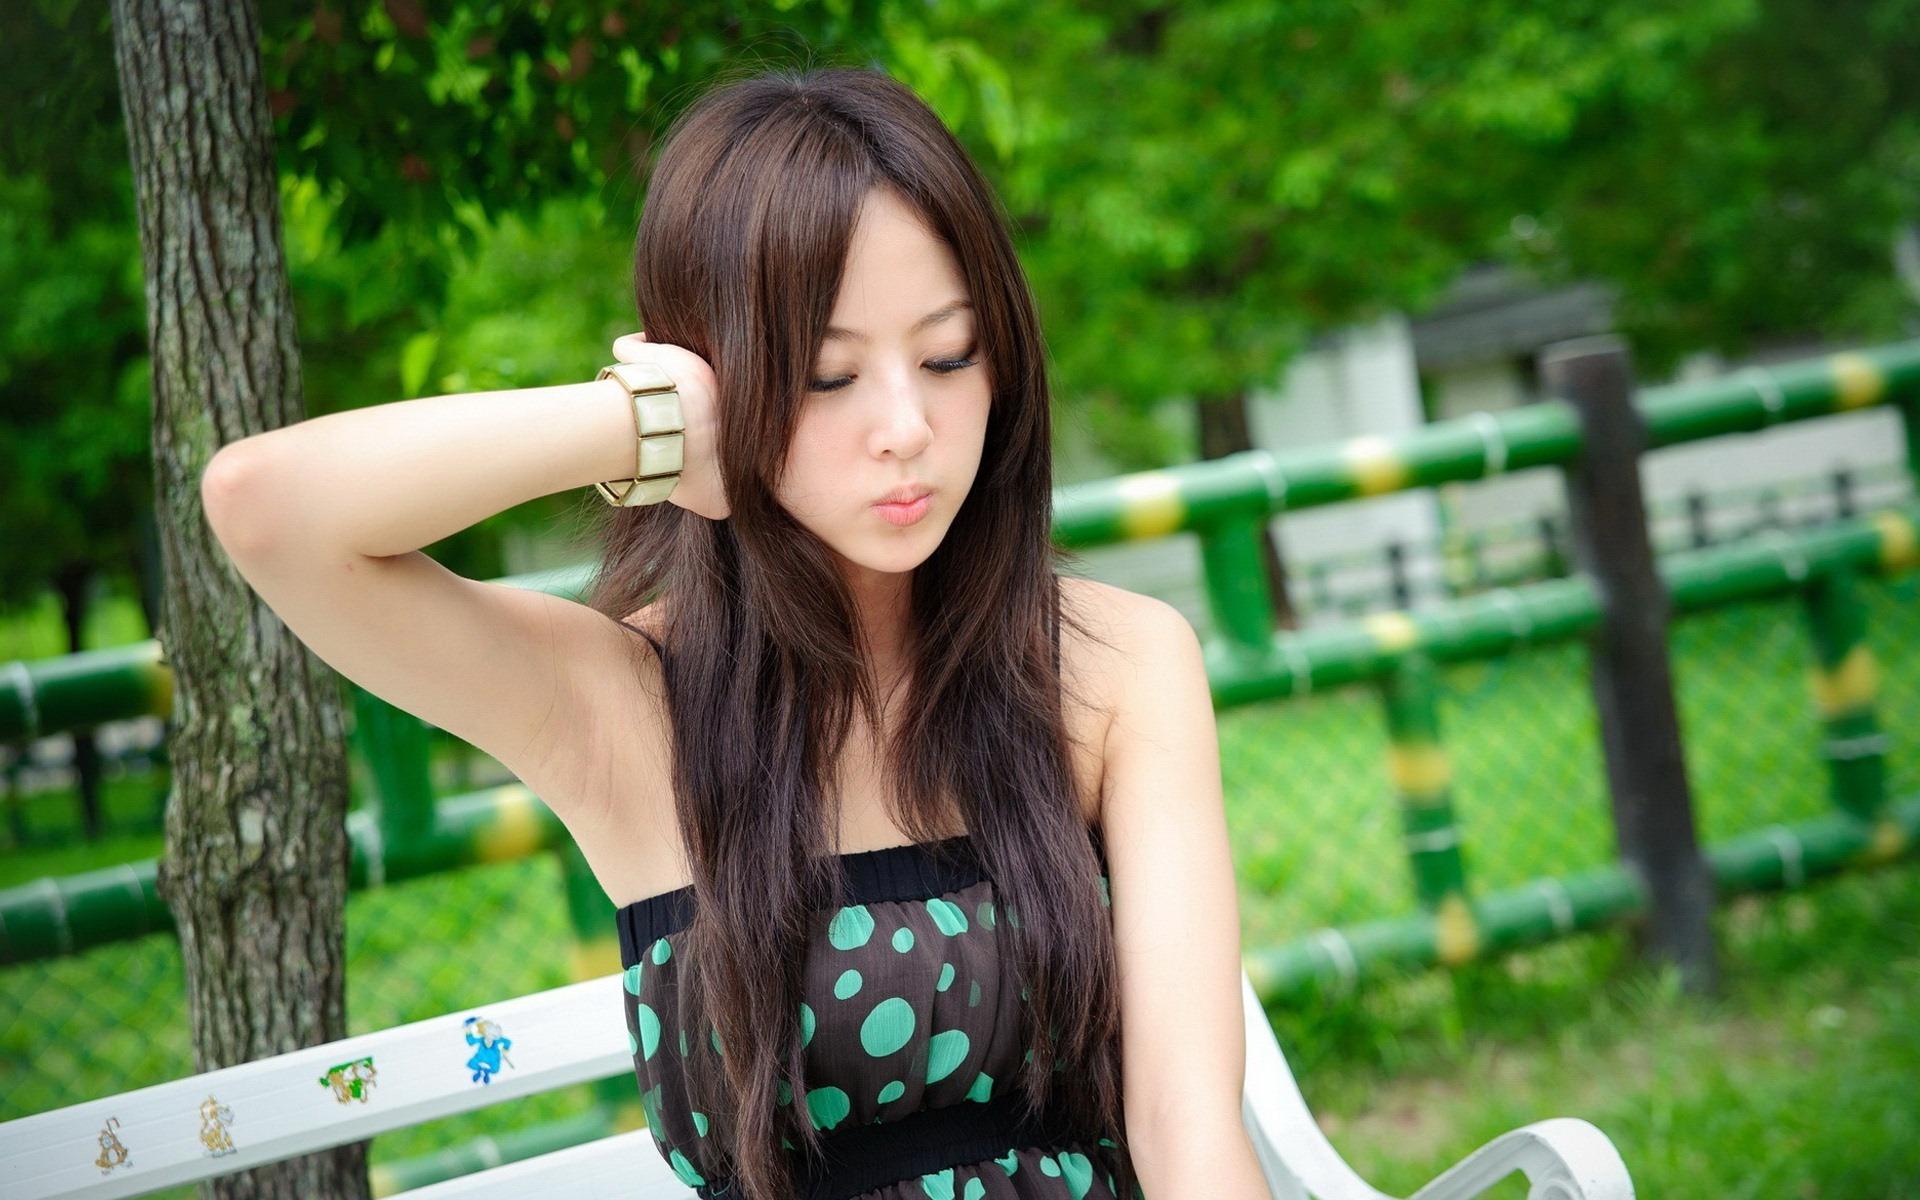 фото тайваньских девушек - 2